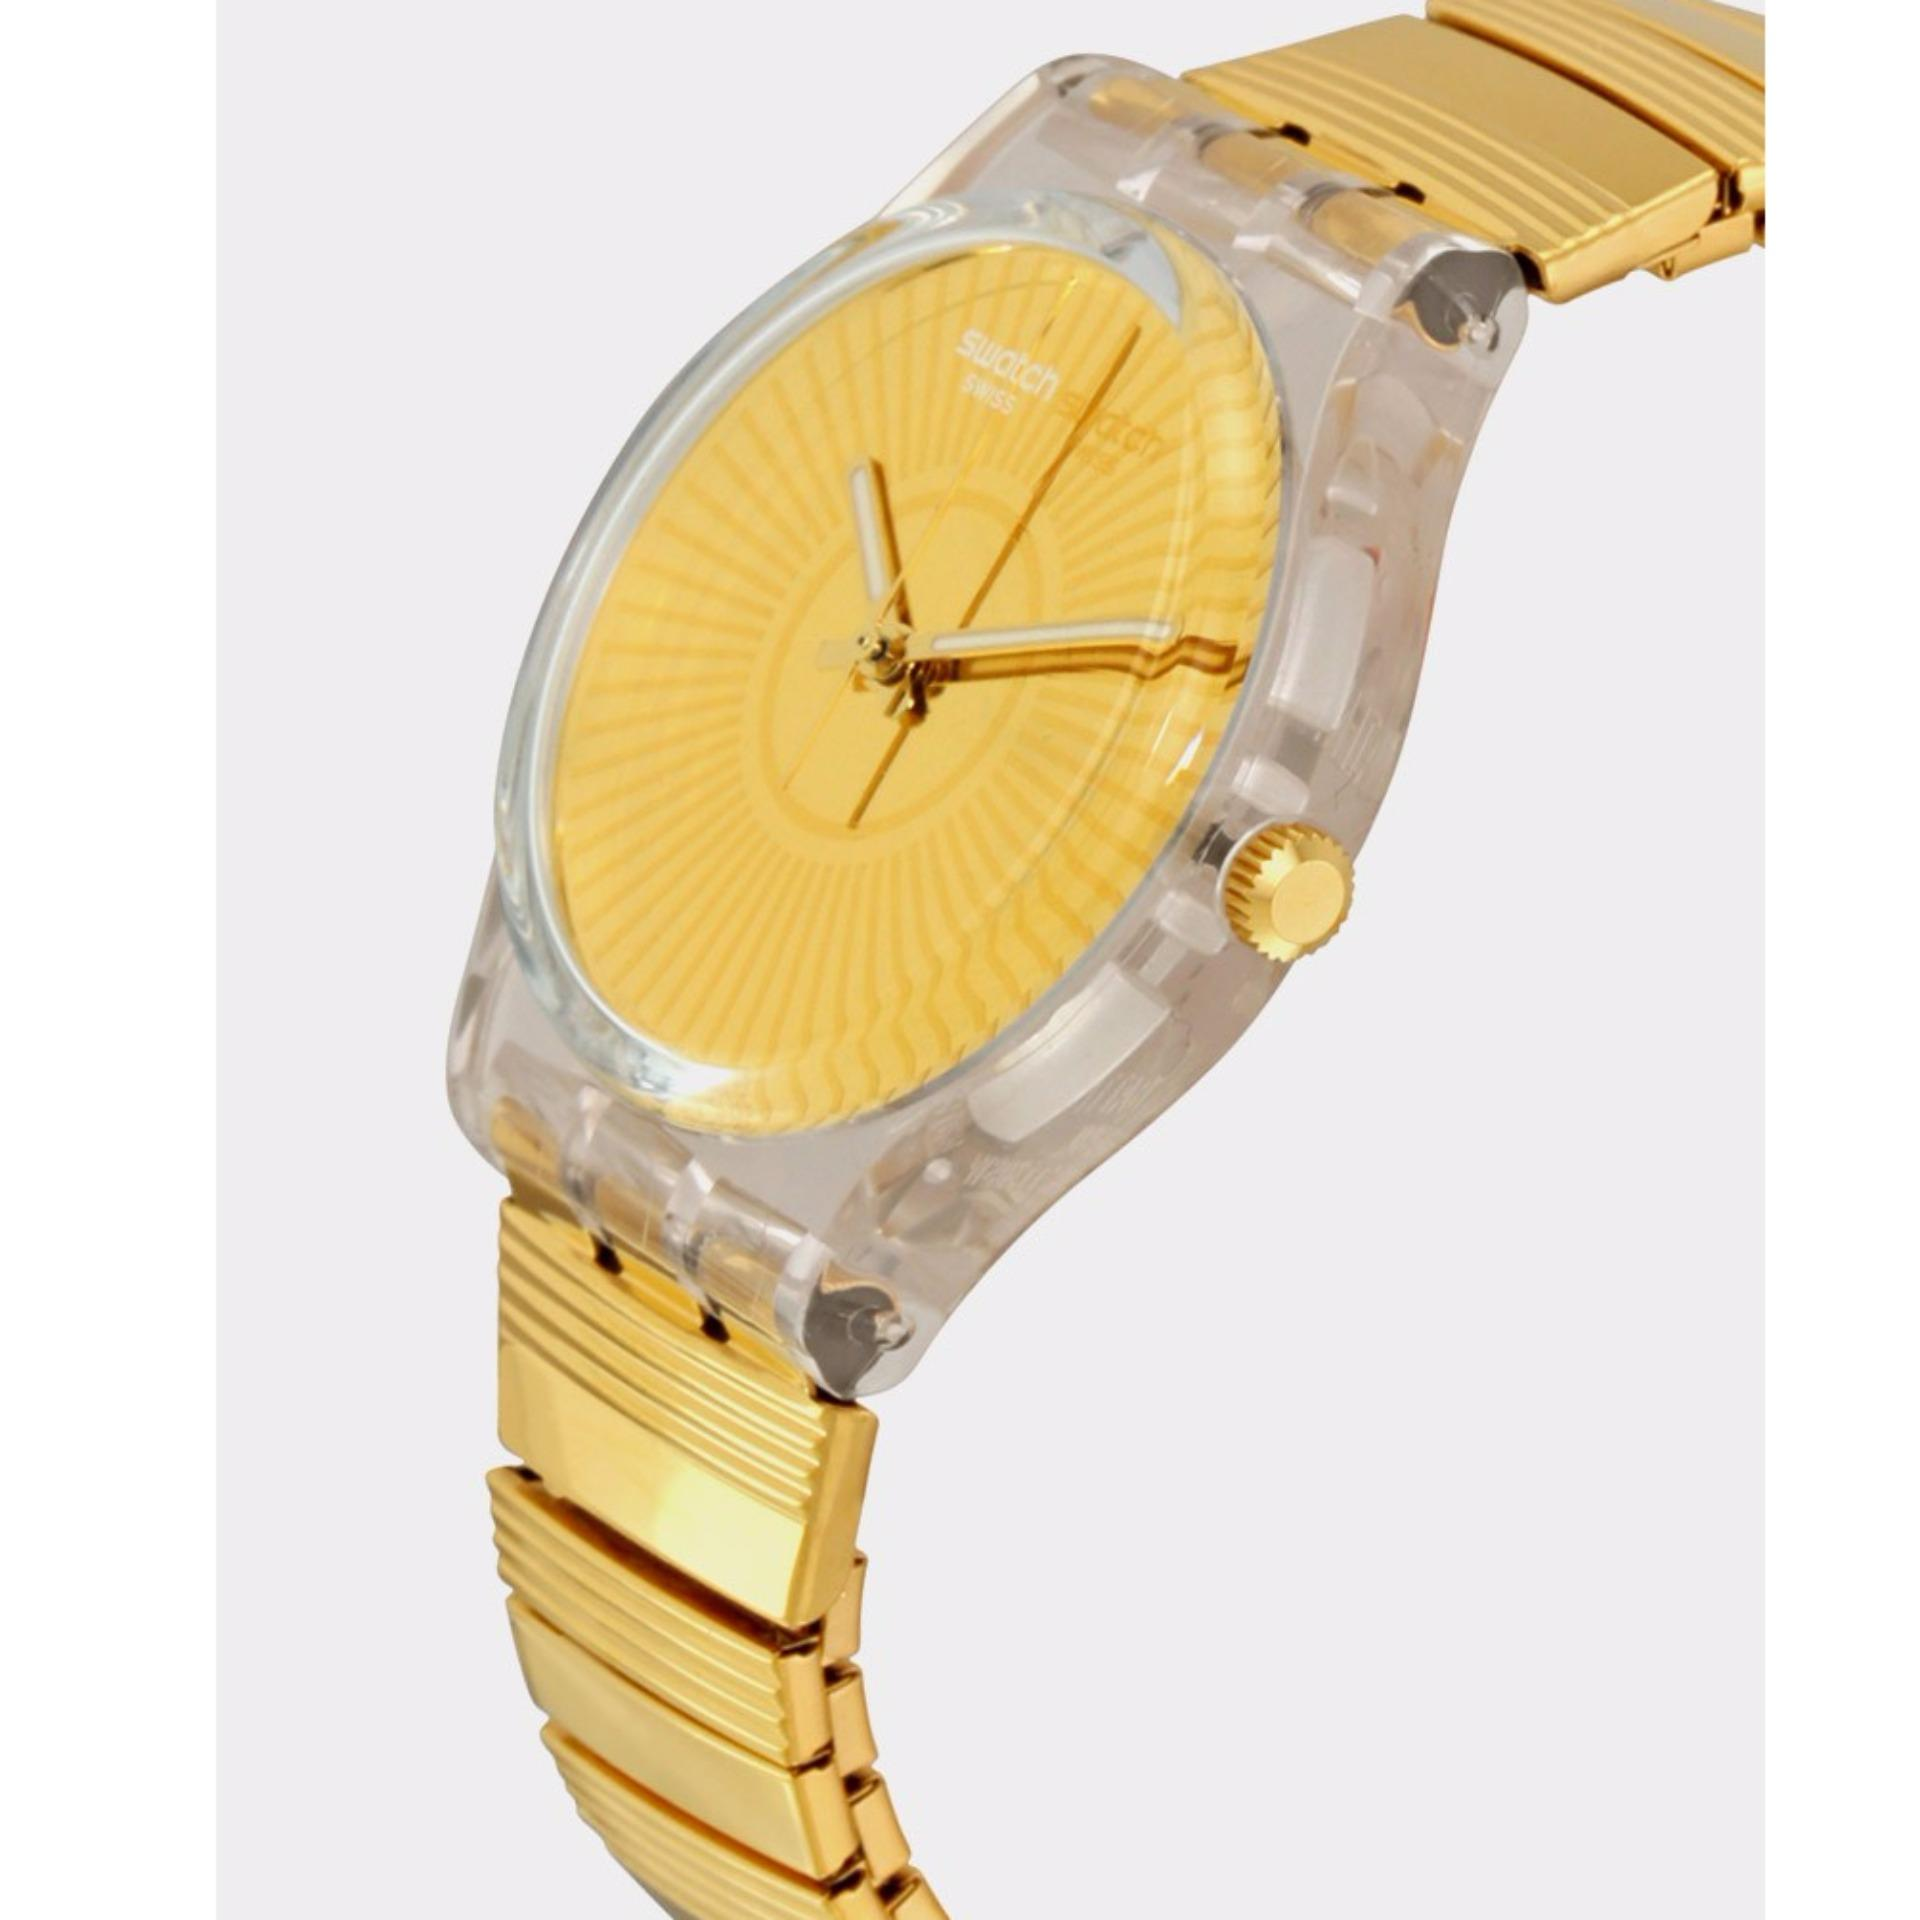 Swatch Jam Tangan Wanita Silver Resin Knit Grey Milanese Sfm118m New Gentleman Suon708 Pria Original Ge244a B Purity Bahan Tali